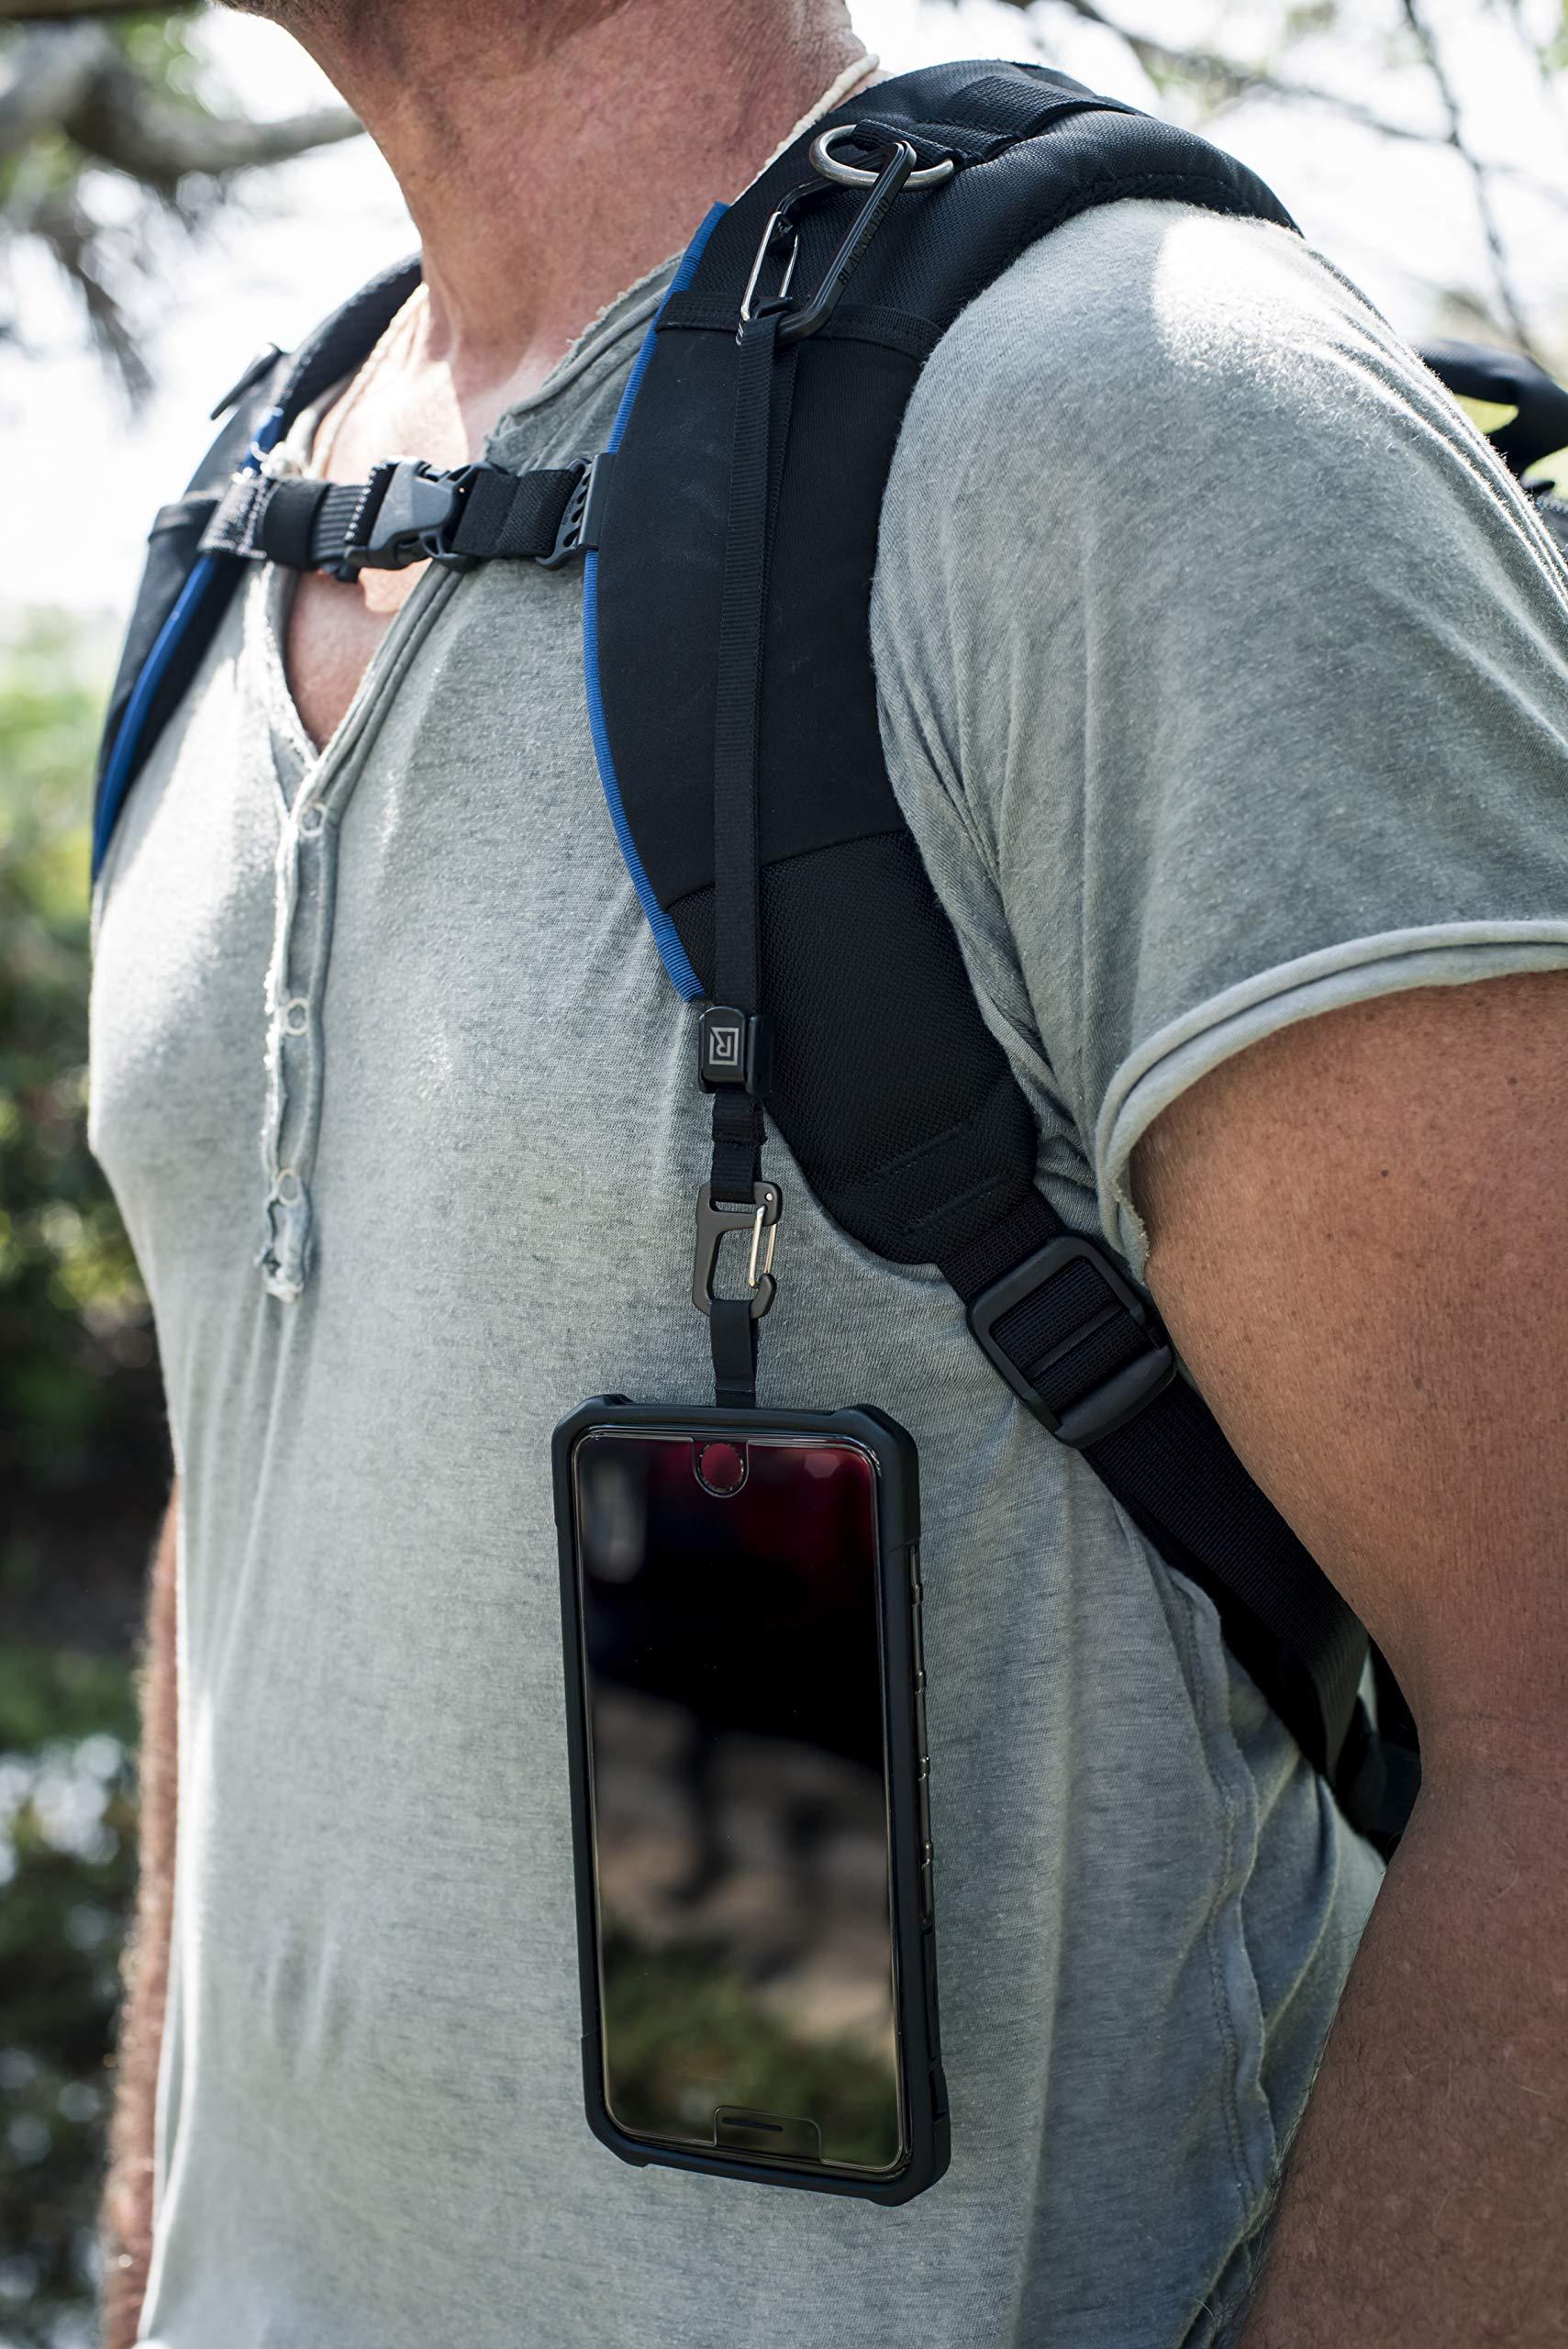 Patented Smartphone Safety Tether System BLACKRAPID Wander Bundle